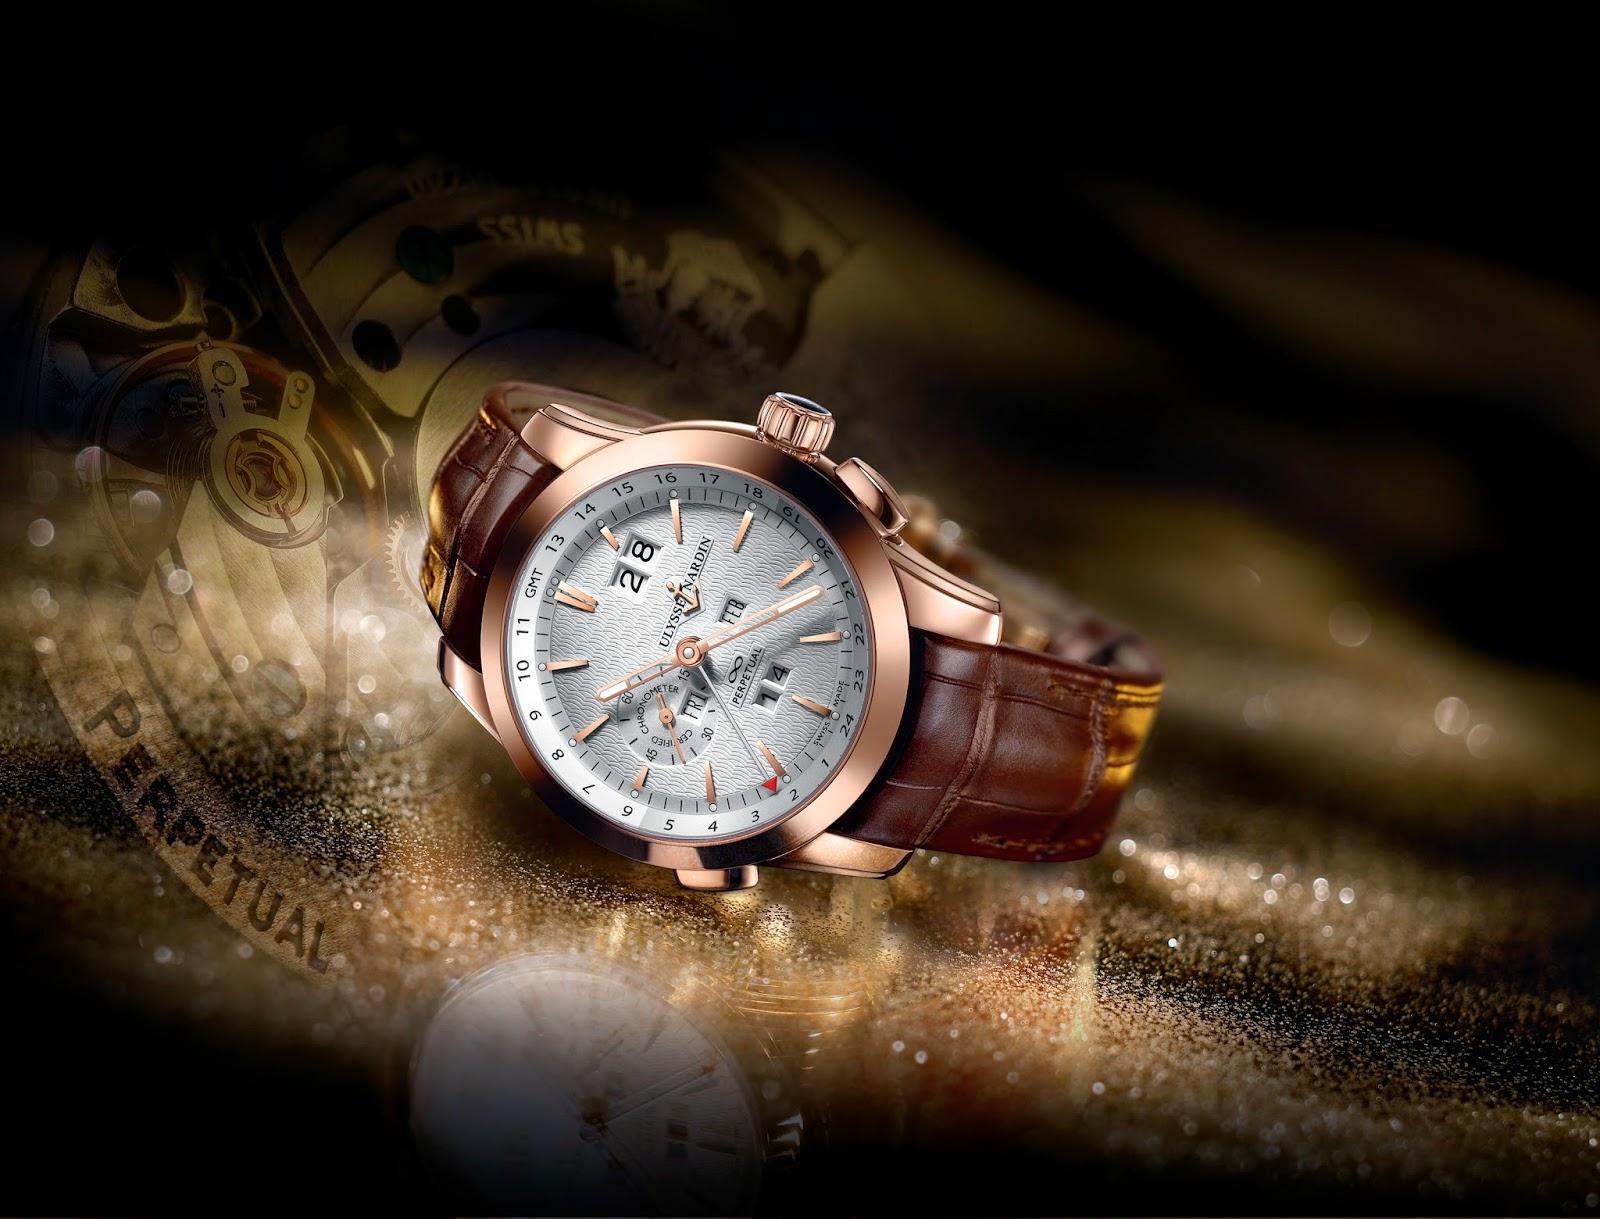 ULYSSE NARDIN reloj 1